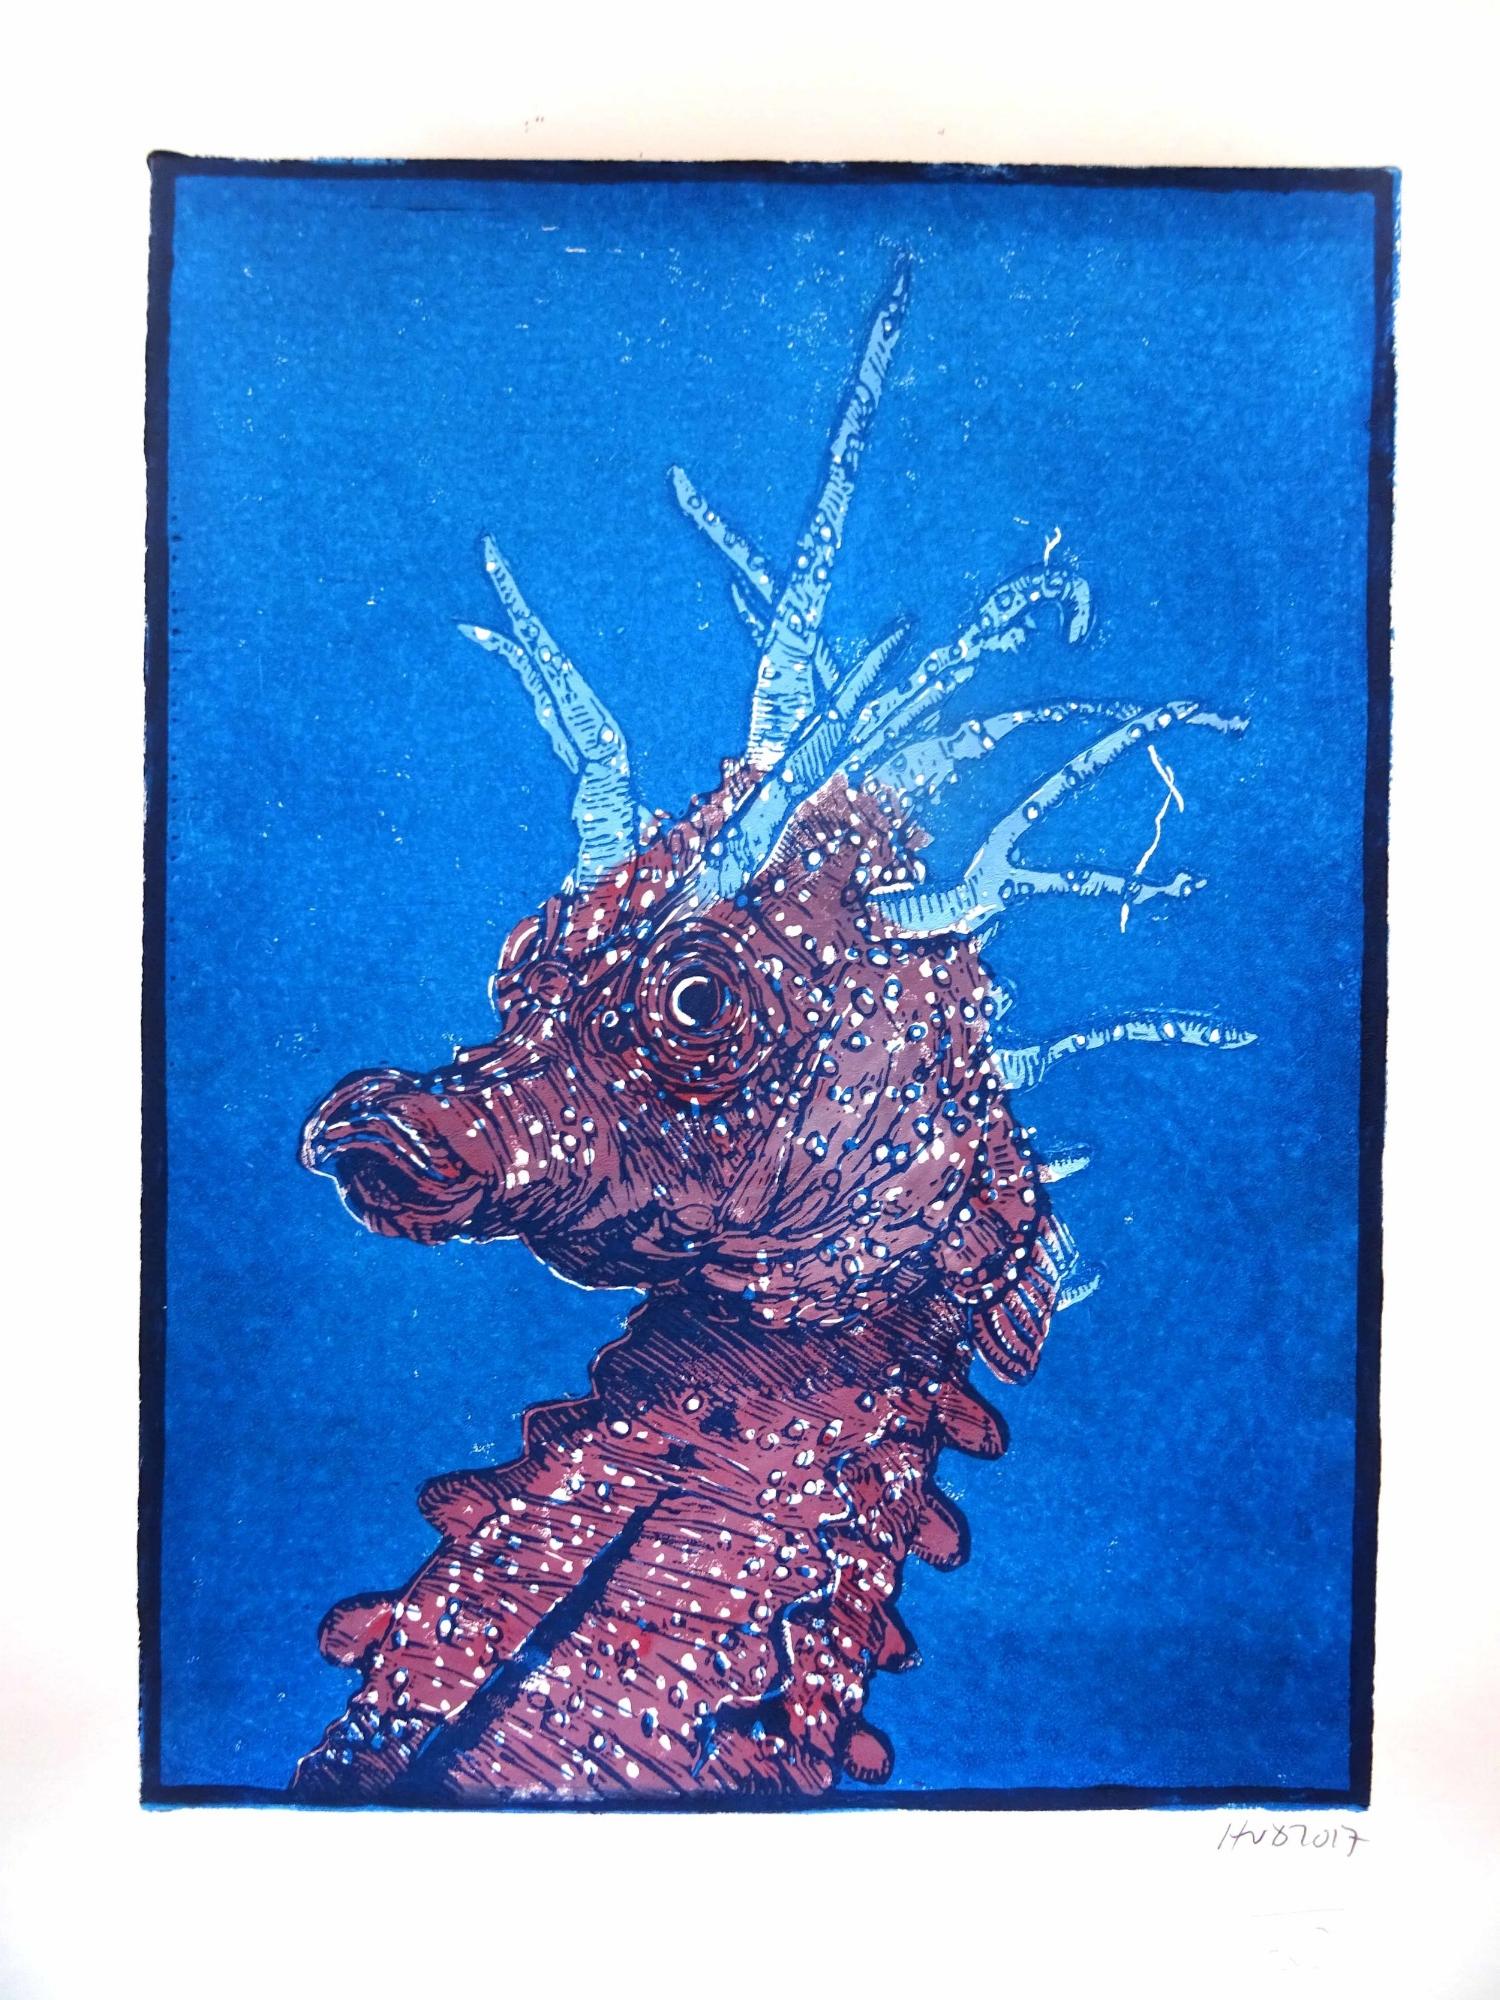 171-2, hippocampe 2, 28x21cm, 2 plate lino, 80 €